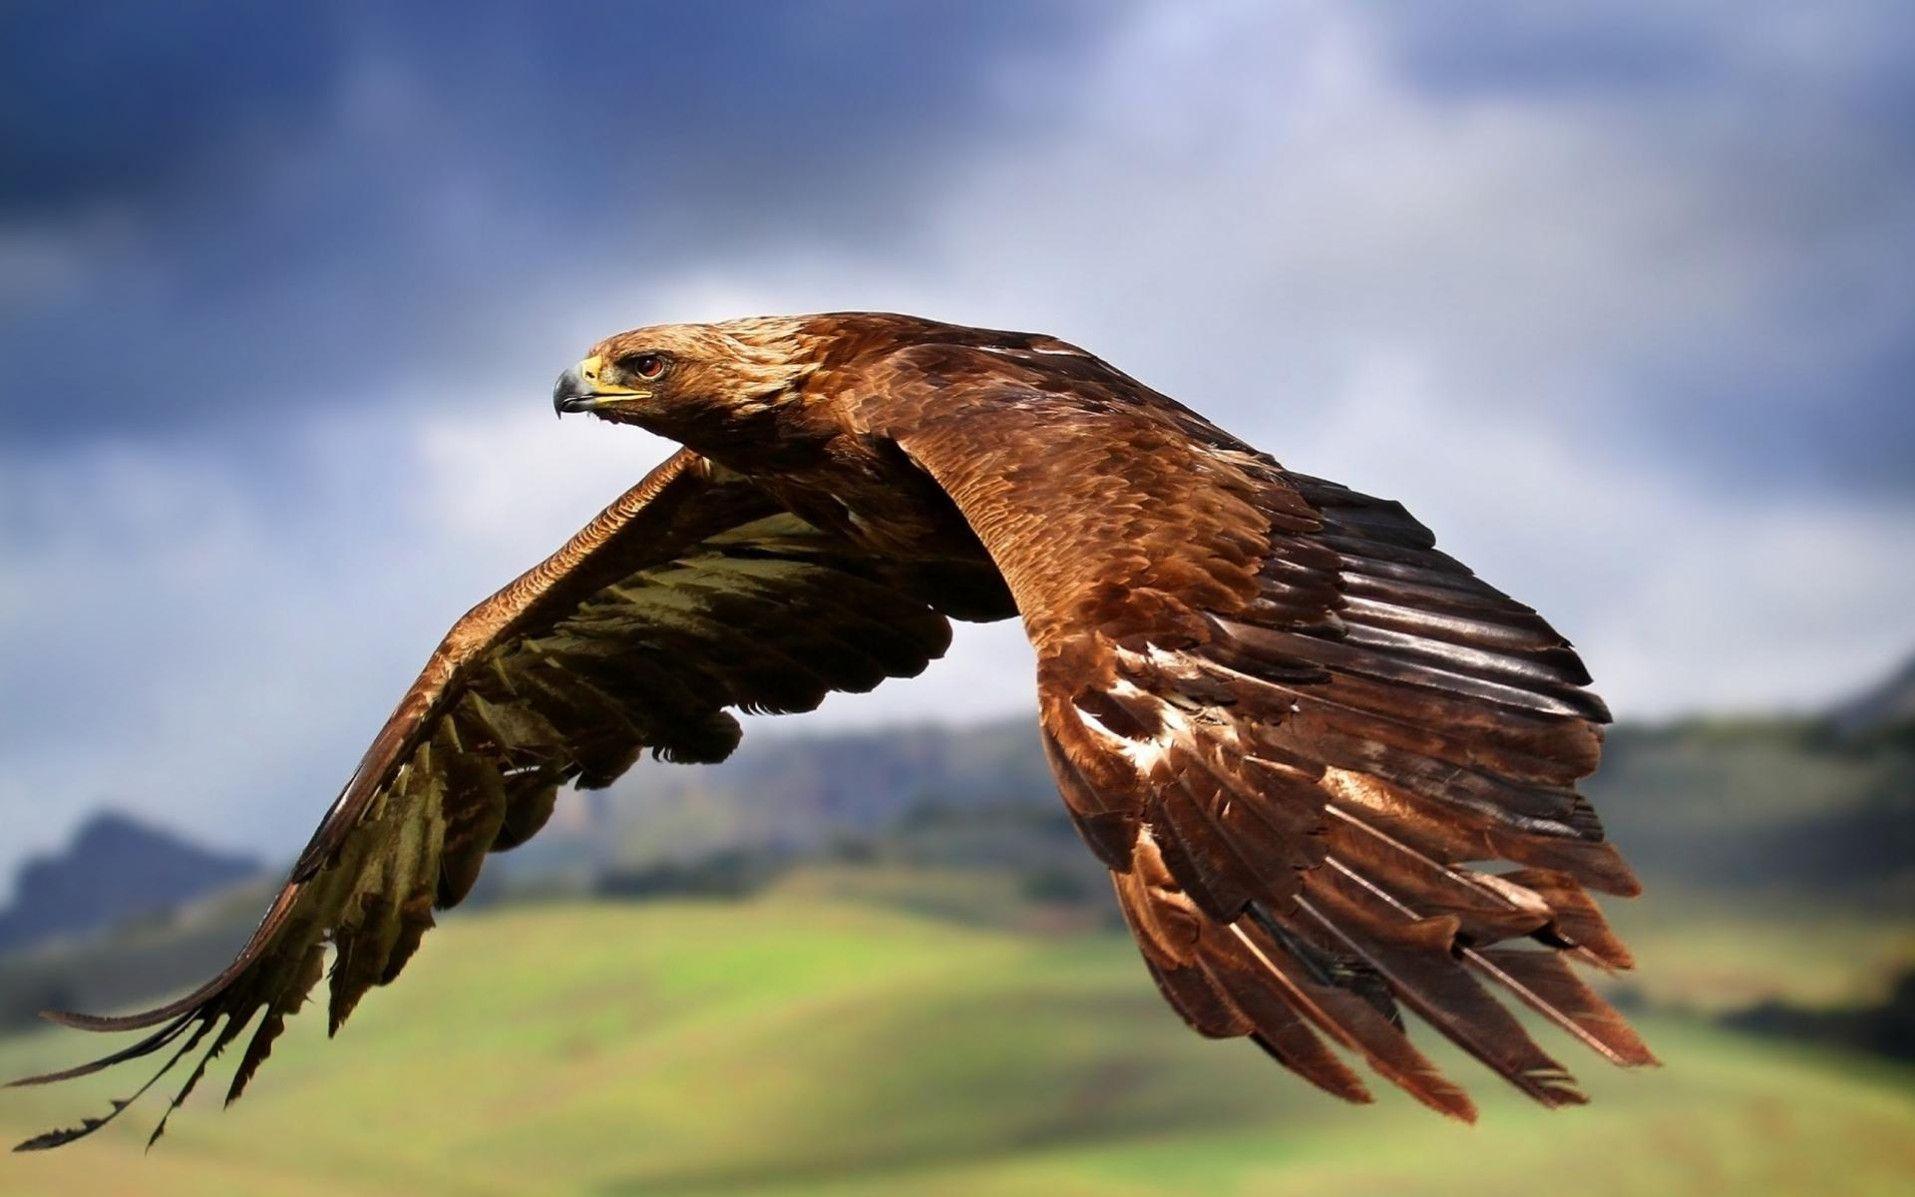 golden-eagle-flying.jpg (1915×1197)